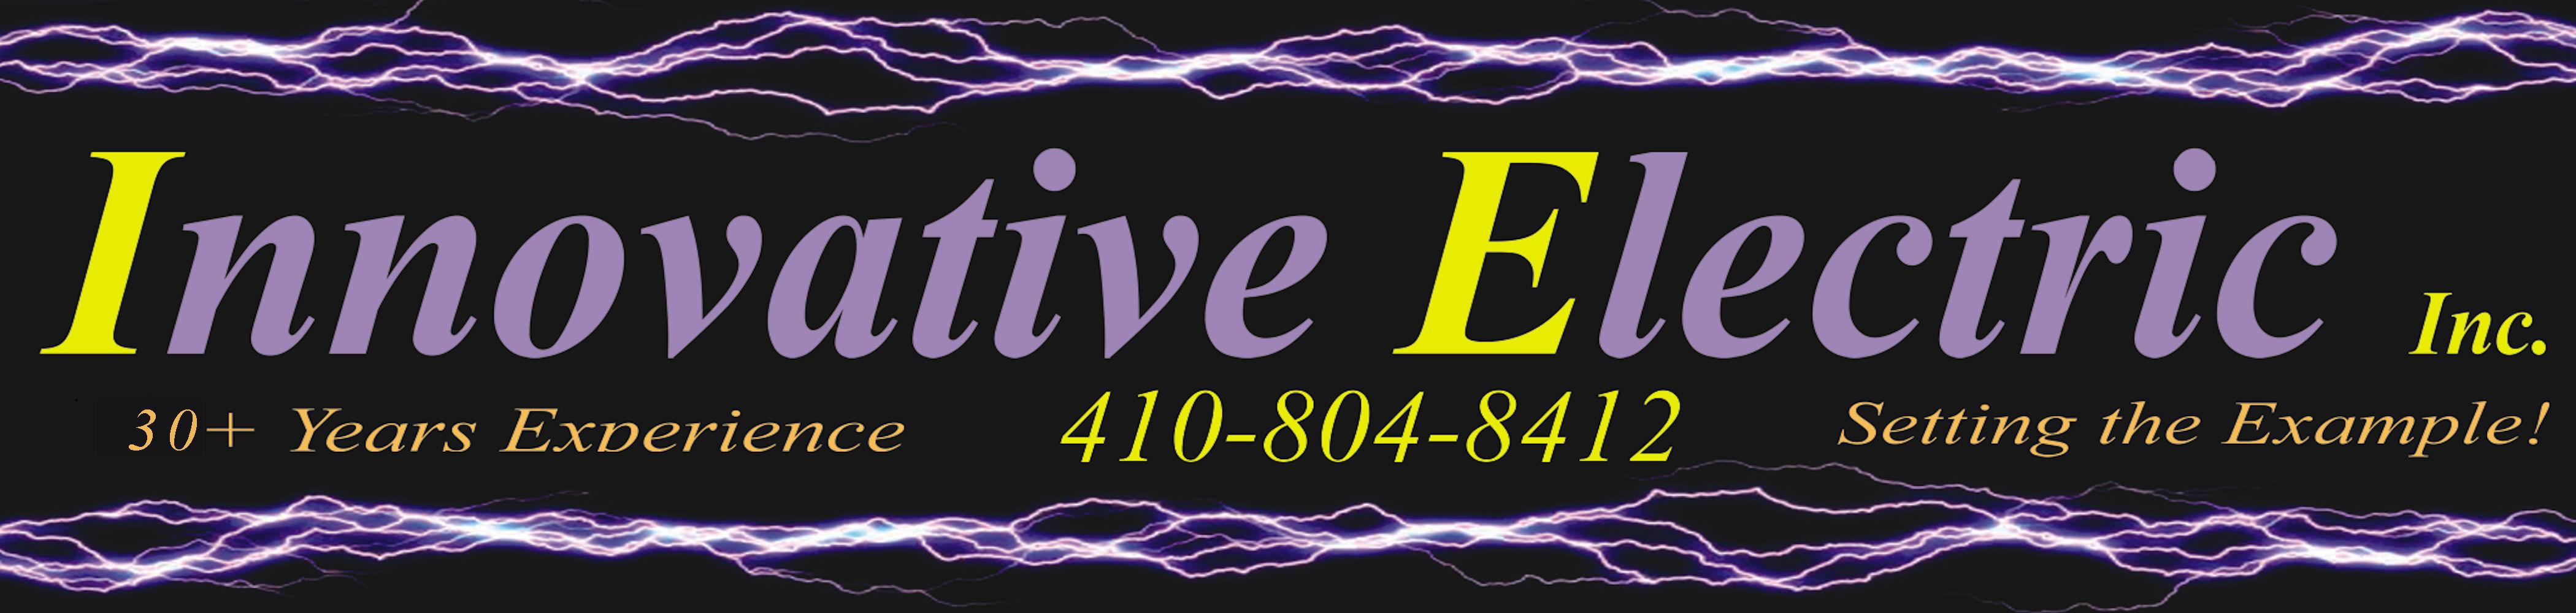 Innovative Electric Inc